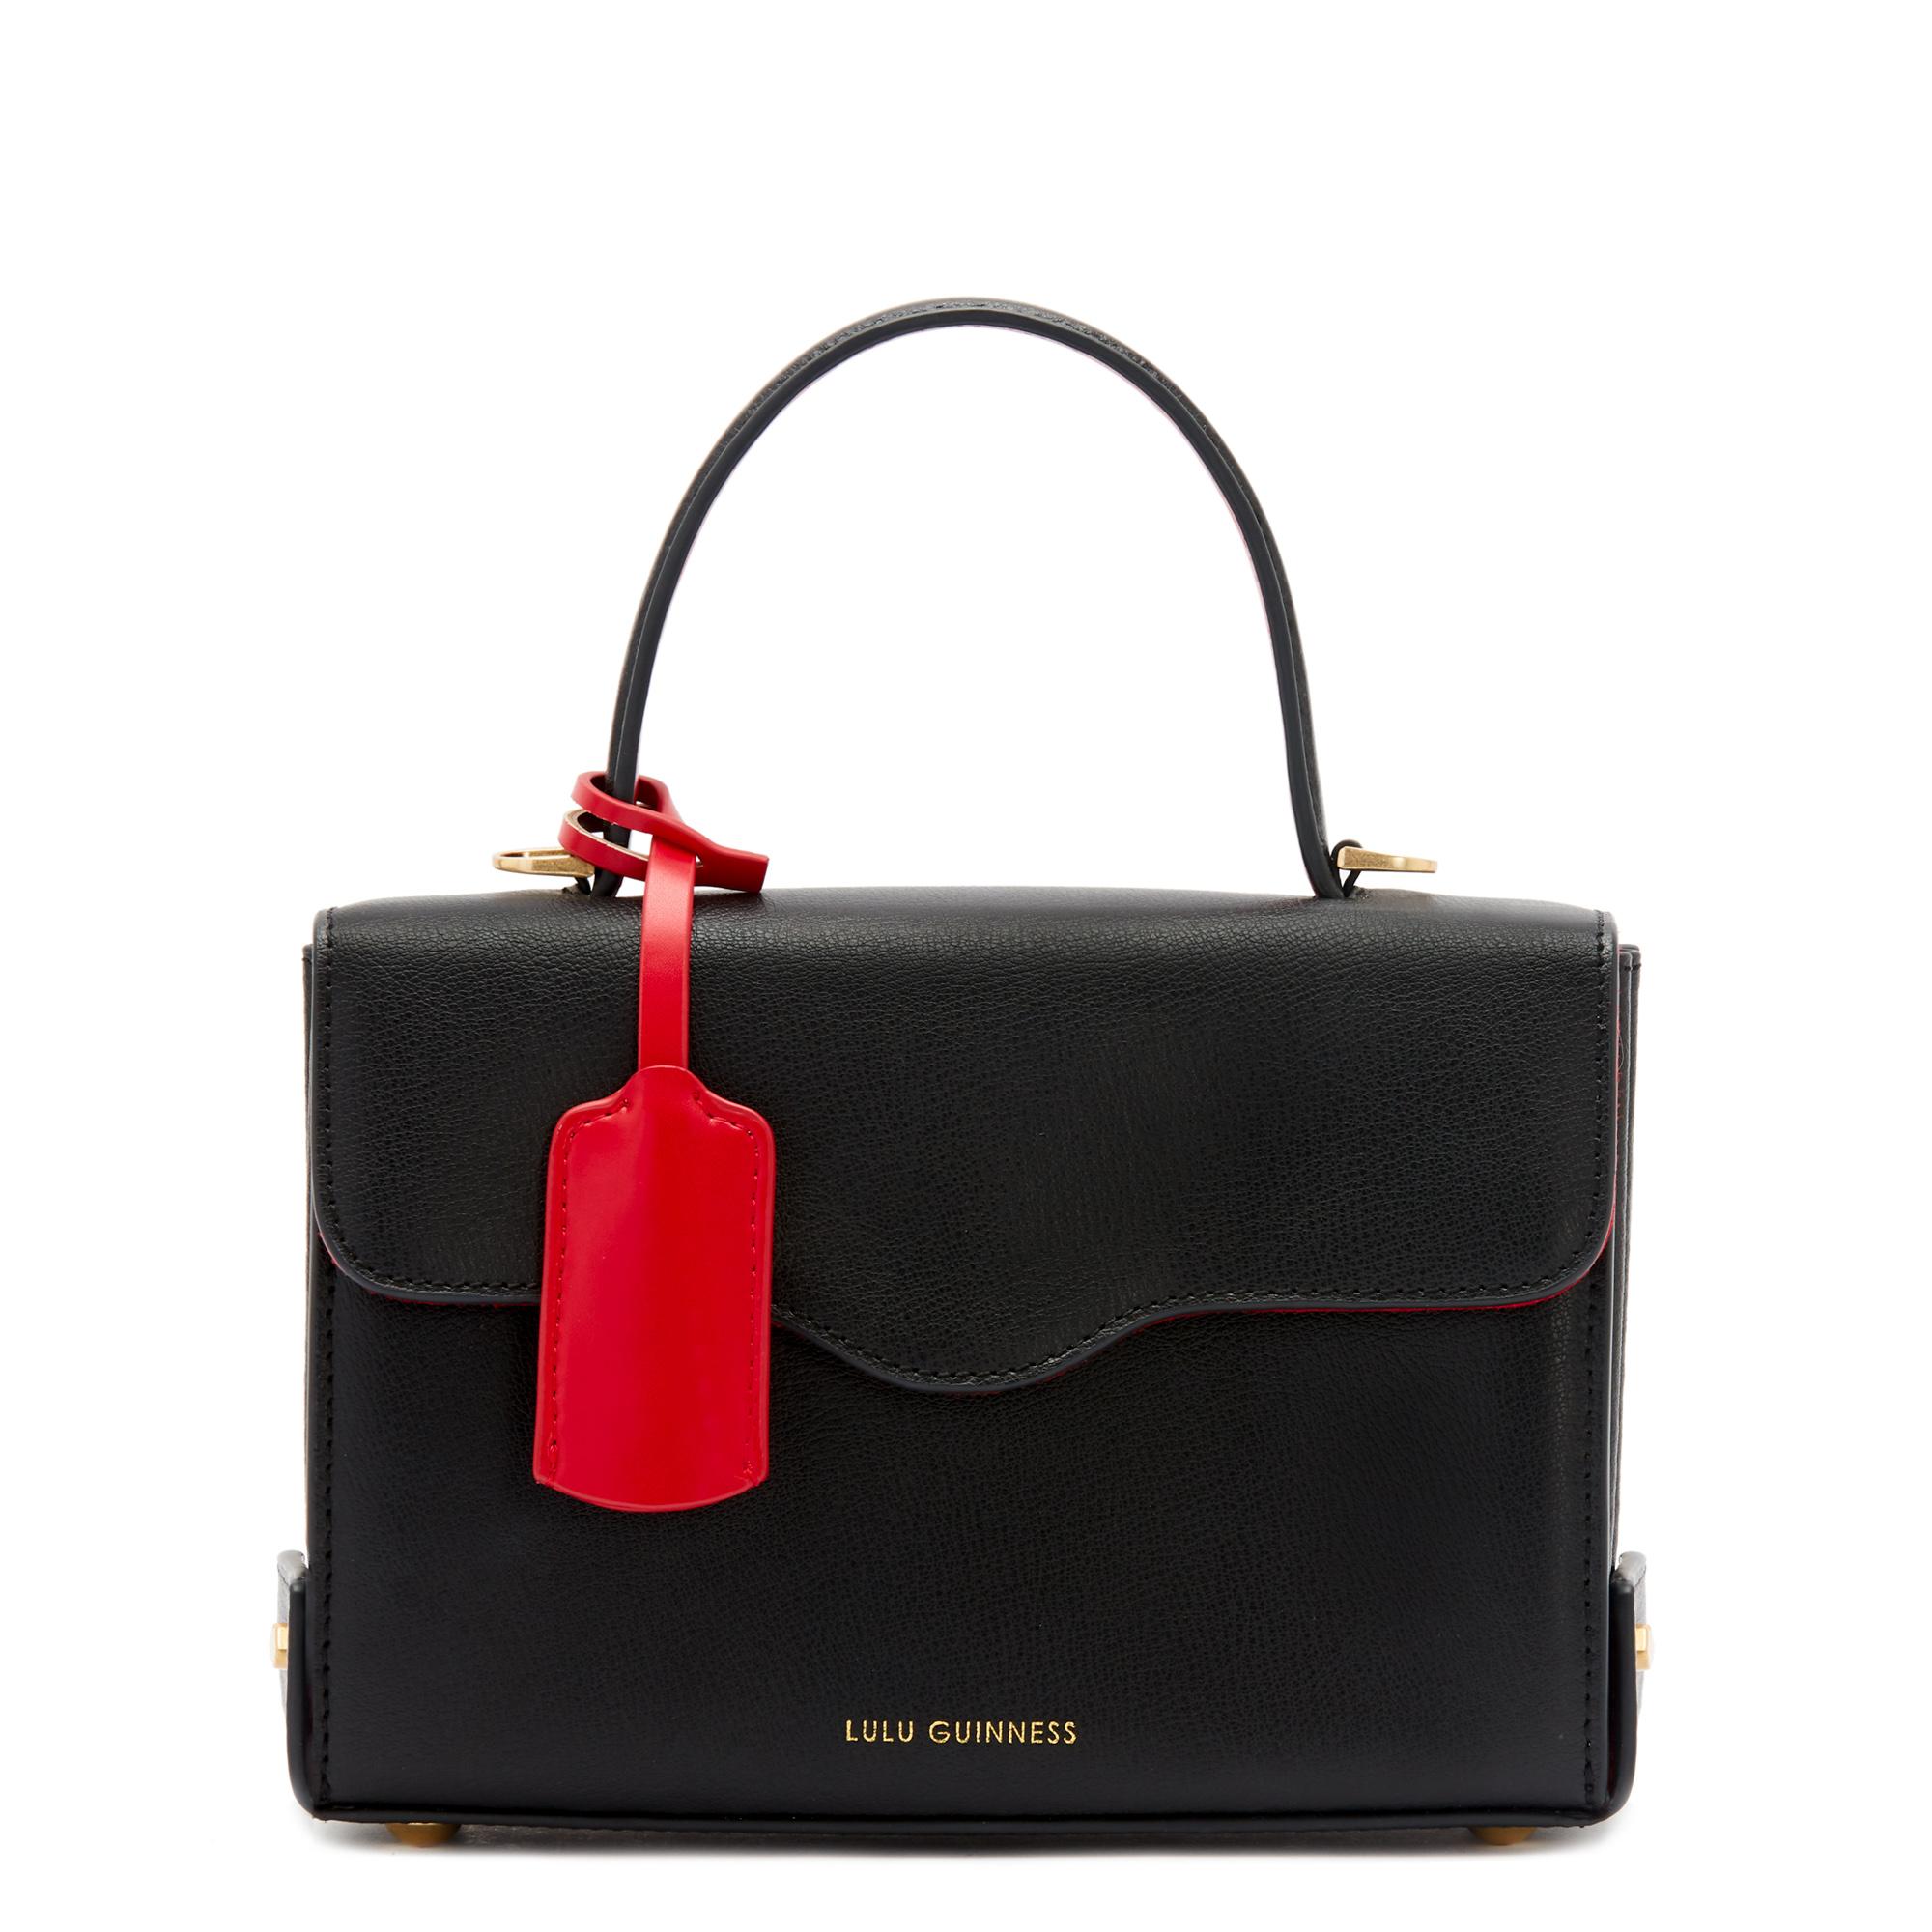 Black Leather Textured Grain Queenie Handbag